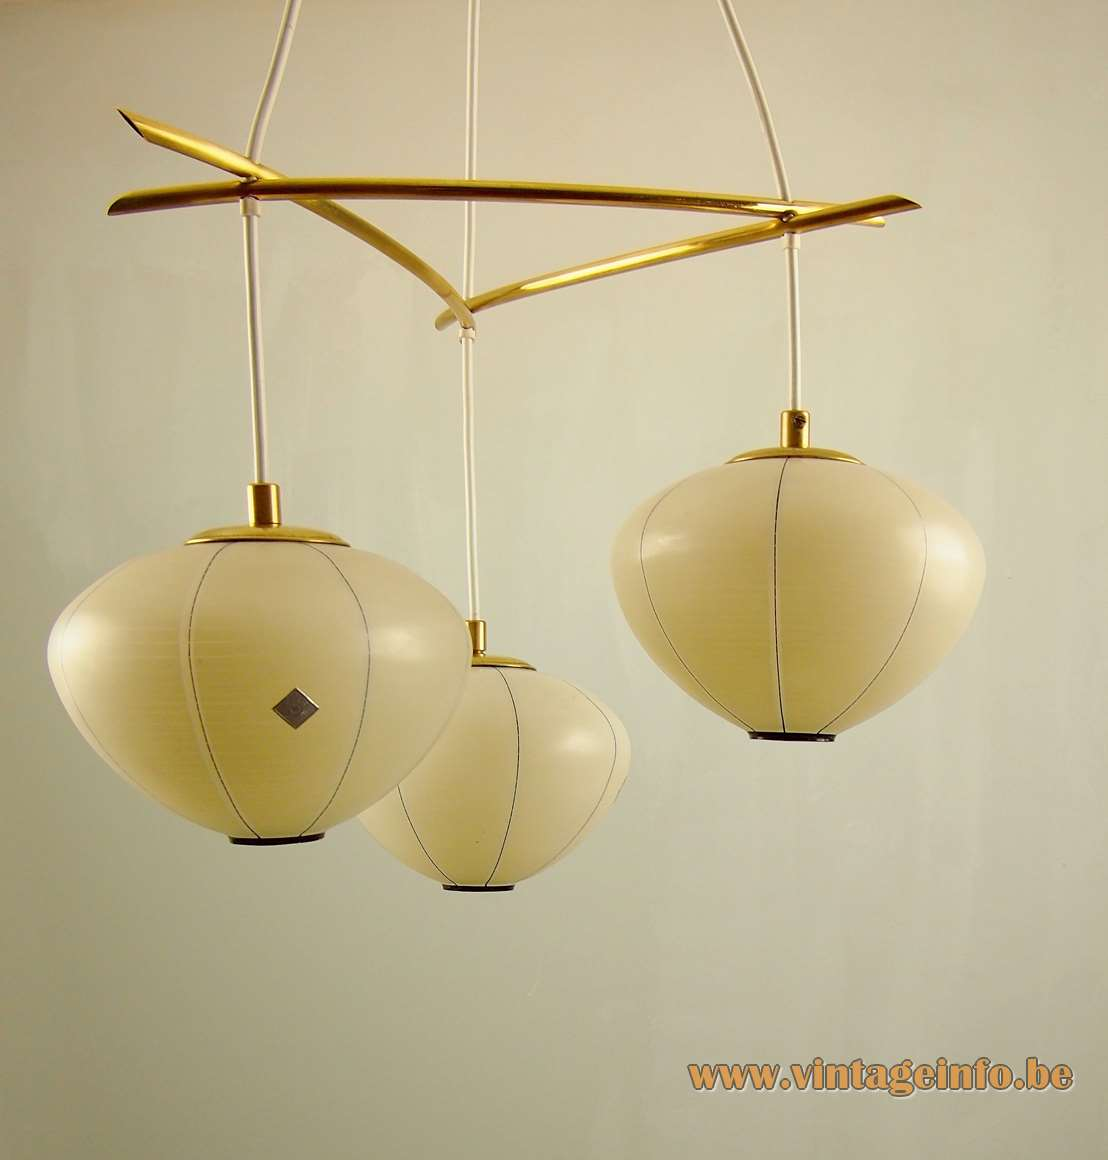 1960s DORIA lampion chandelier yellow amber glass lantern globes Mikado curved brass rods 1950s Germany